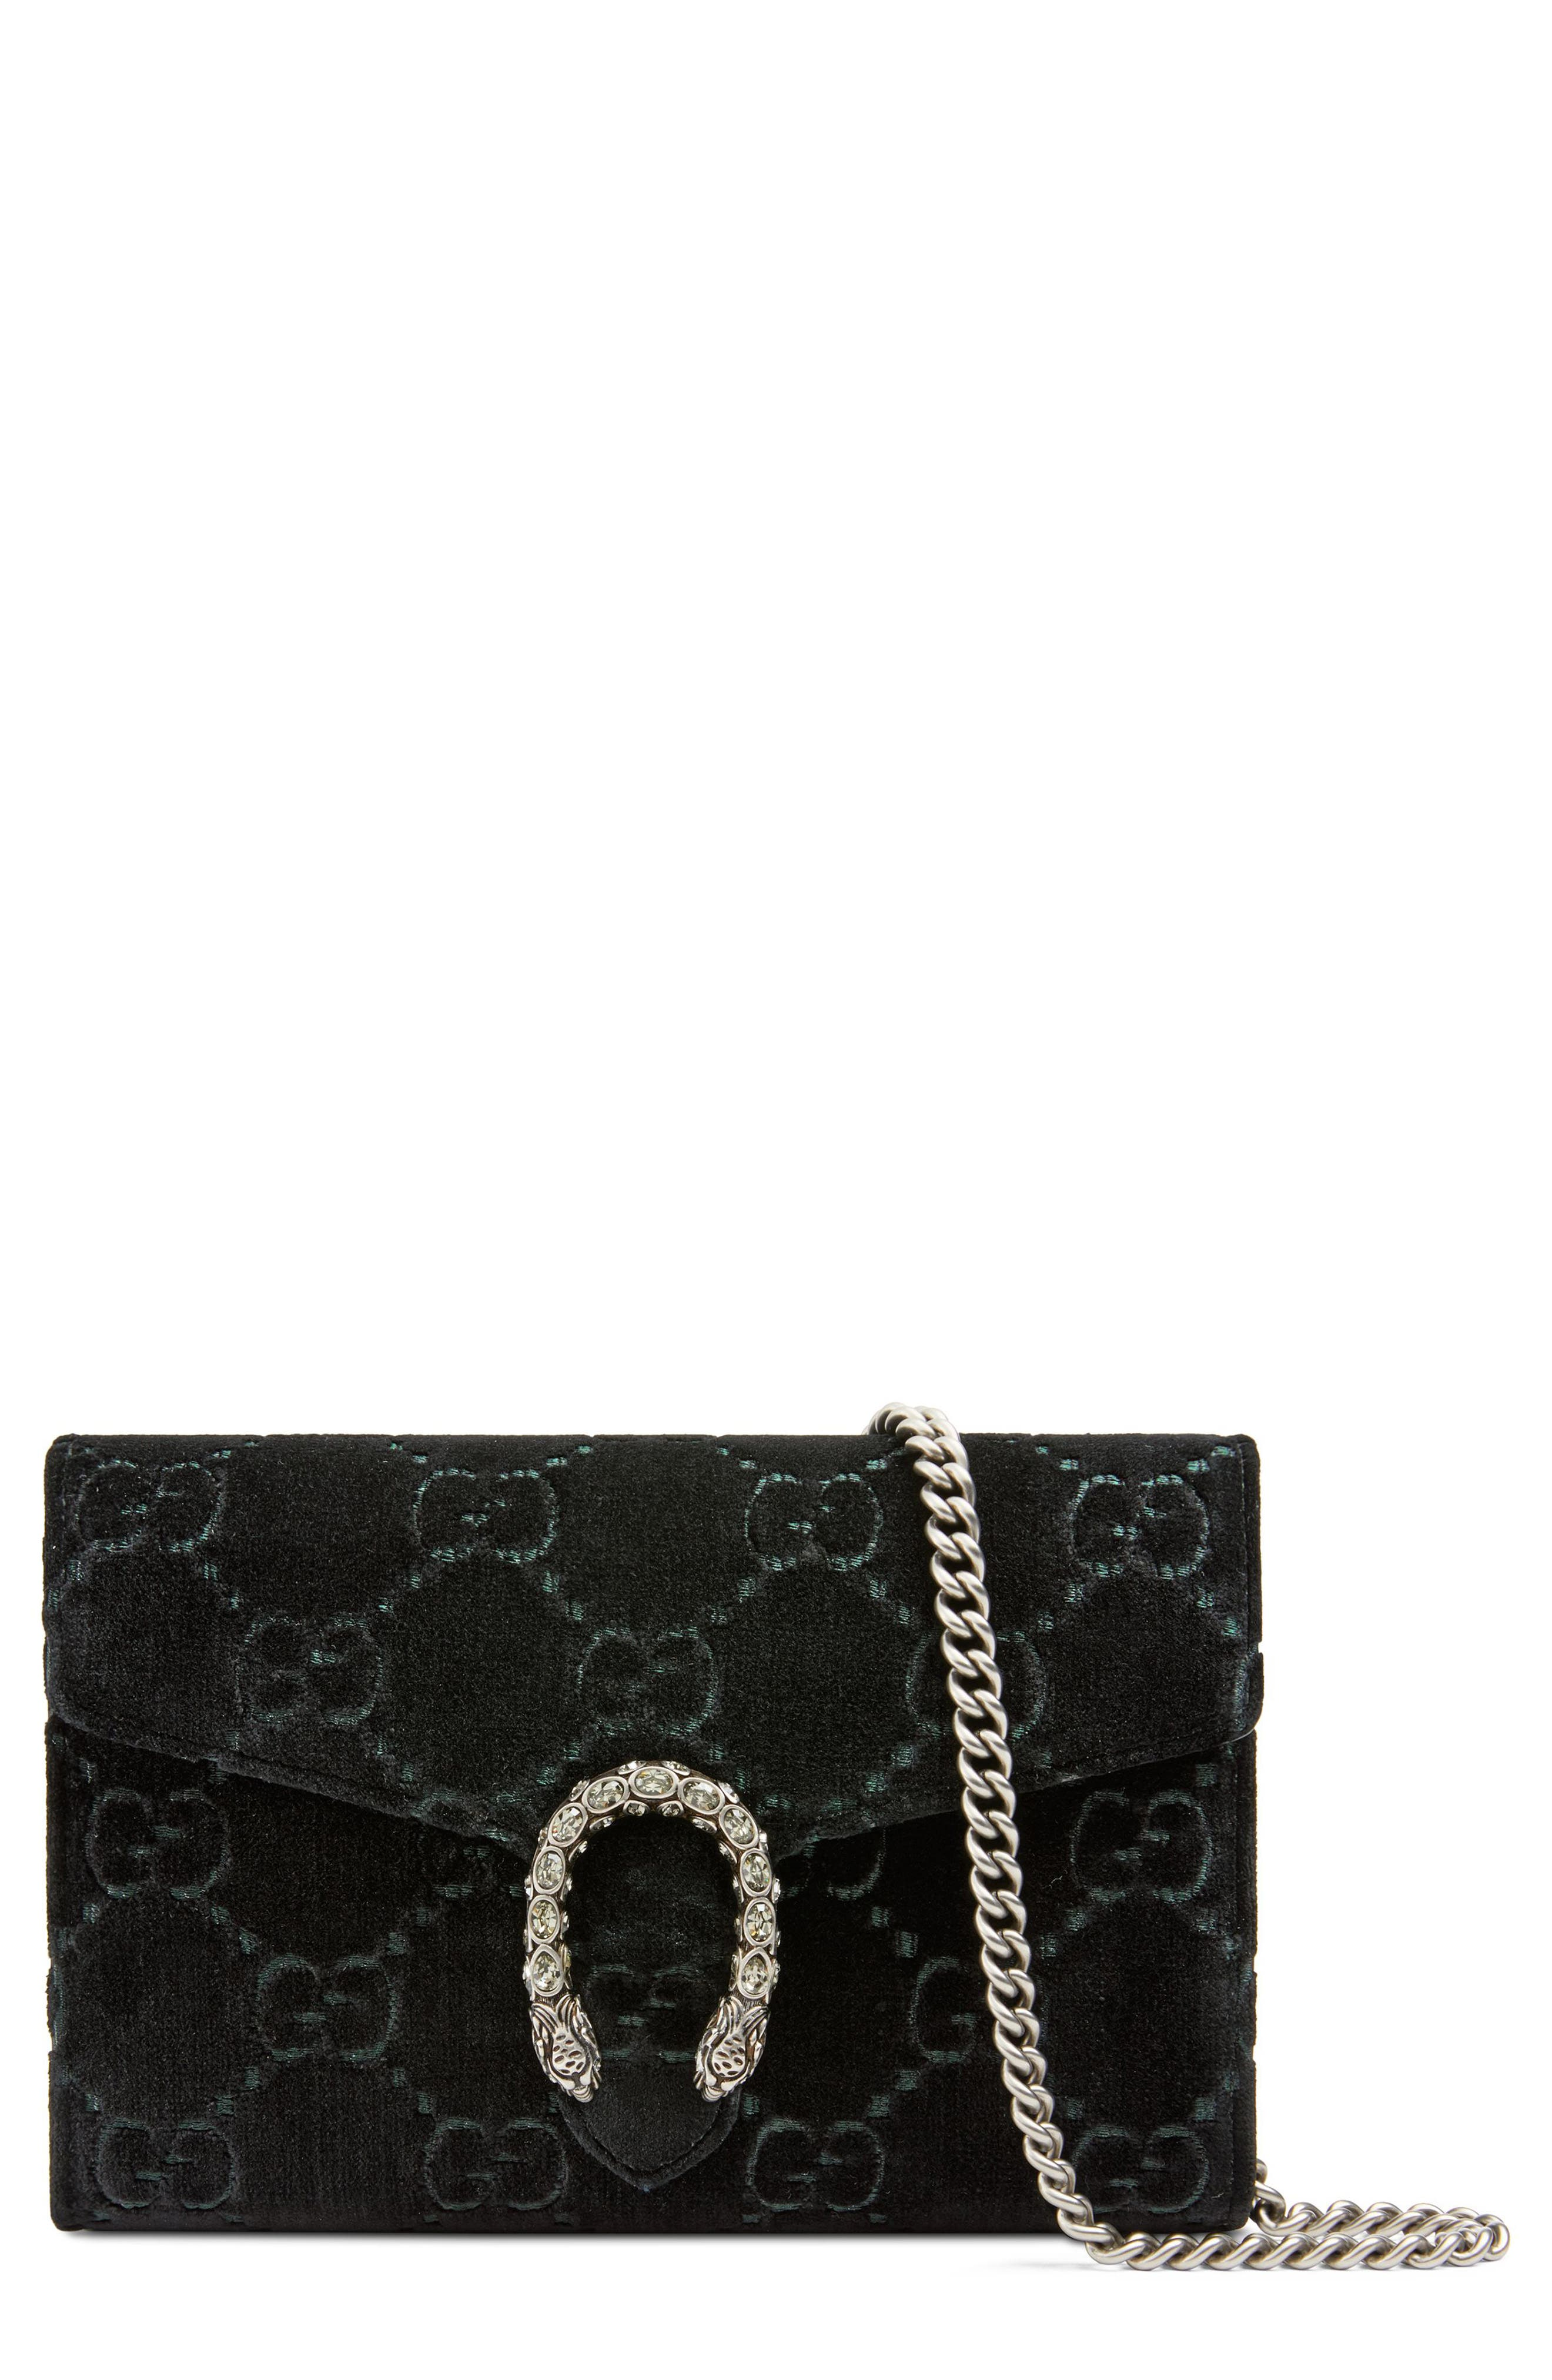 Dionysus Velvet Wallet on a Chain,                             Main thumbnail 1, color,                             Nero/ Nero/ Black Diamond